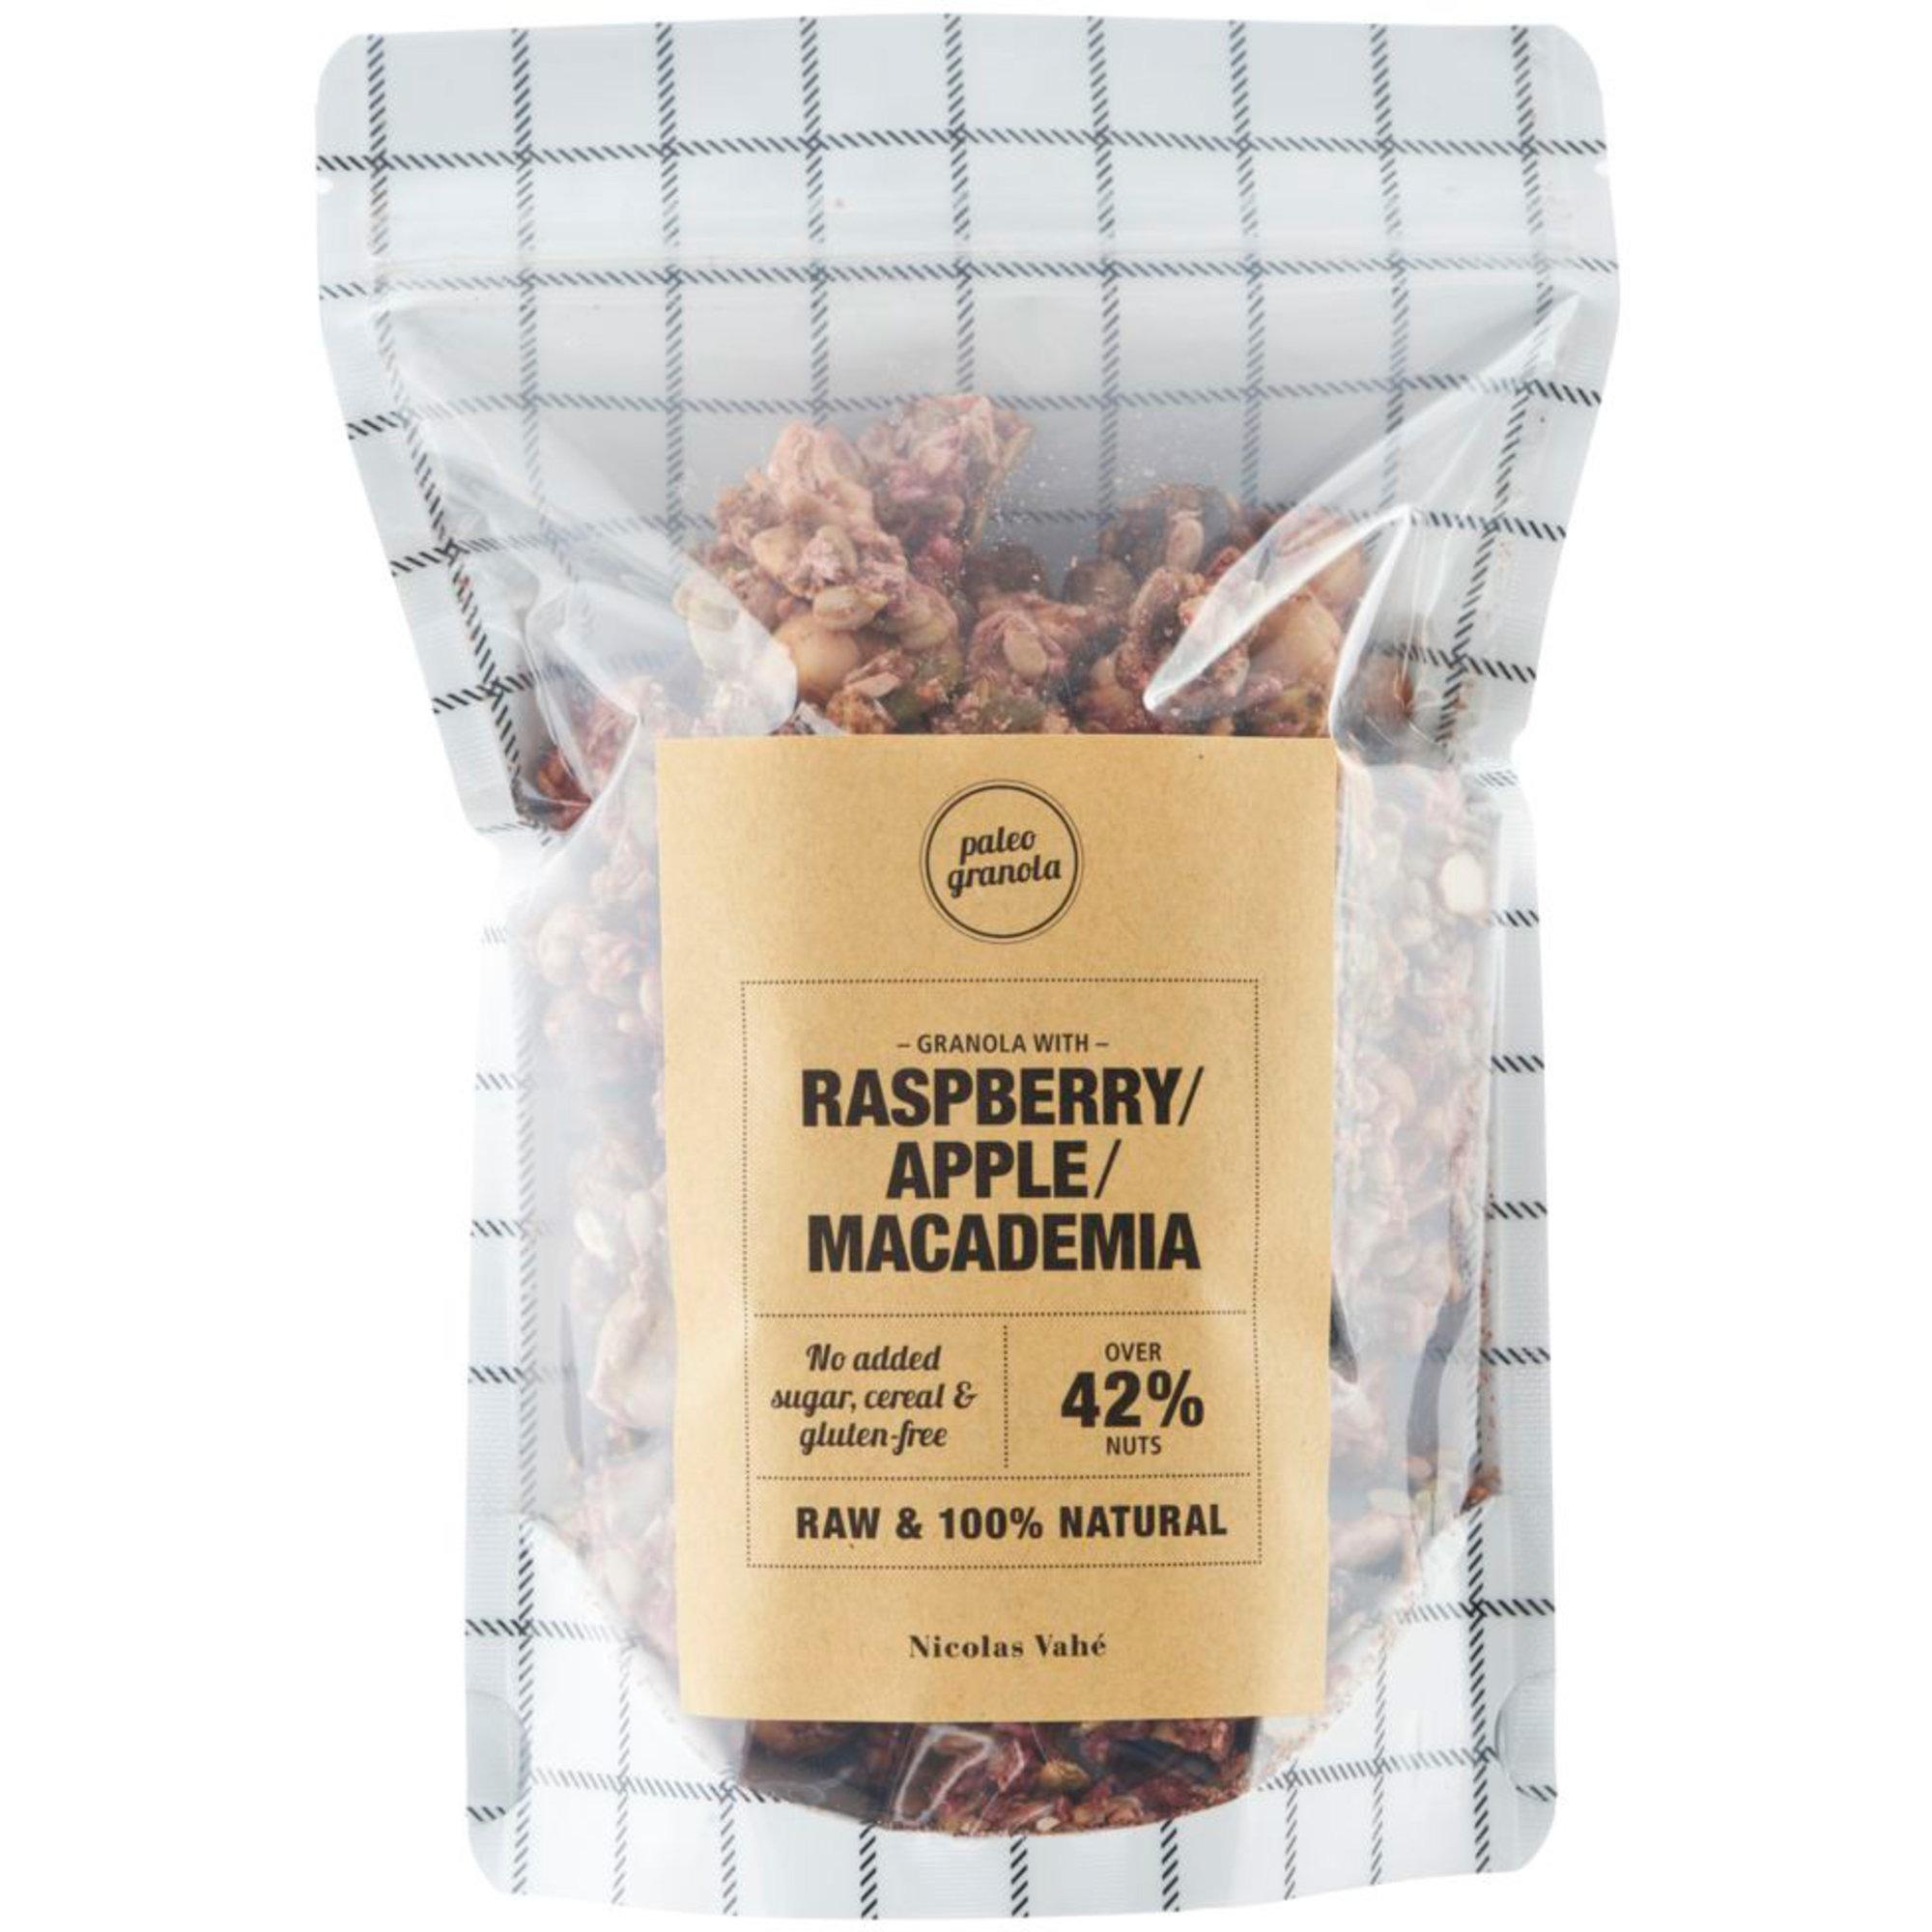 Nicolas Vahé Granola m. hallon äpple och macademianötter